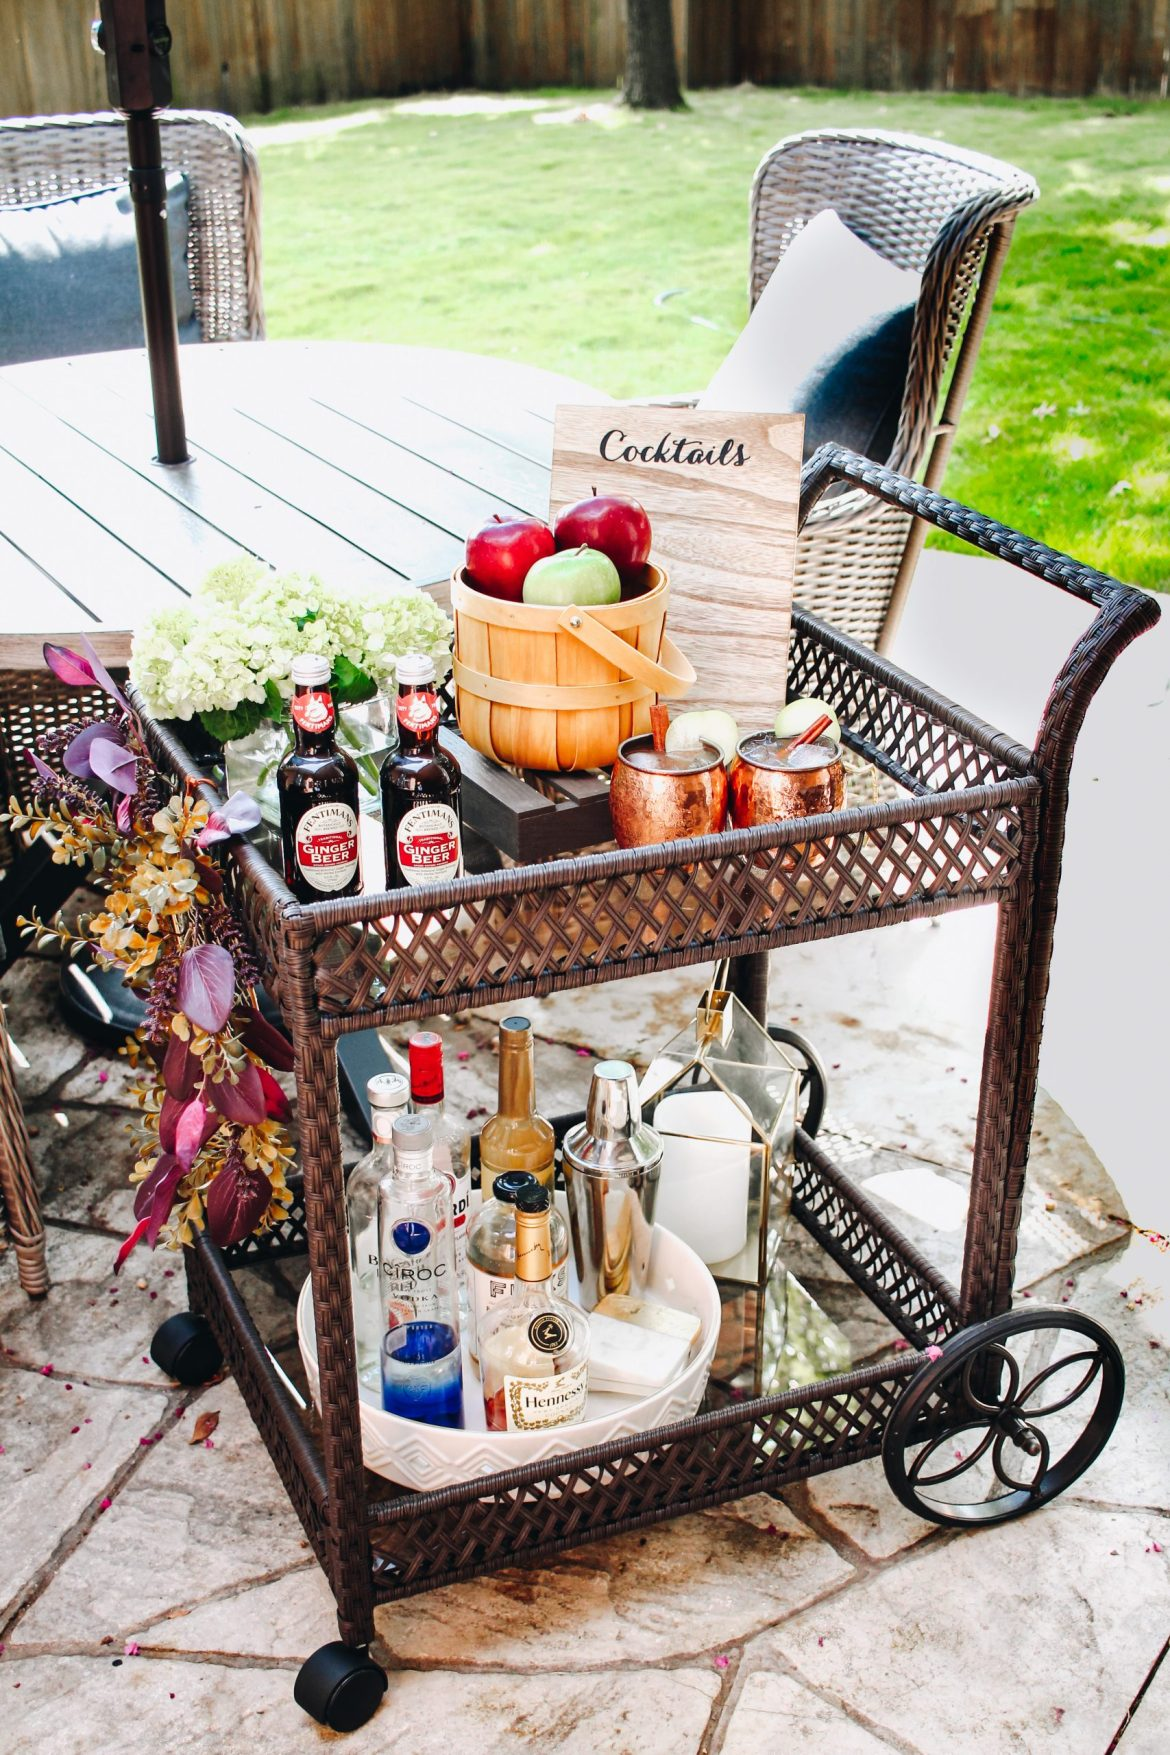 bar cart, how to style bar cart, bar cart styling, bar decor, patio decor ideas, fall bar cart styling, how to style bar cart fall, wicker bar cart, outdoor bar cart ideas, bar cart ideas, fall outdoor ideas, party decor ideas ,fall wreath ideas, dallas blogger, dallas black blogger, black lifestyle blogger